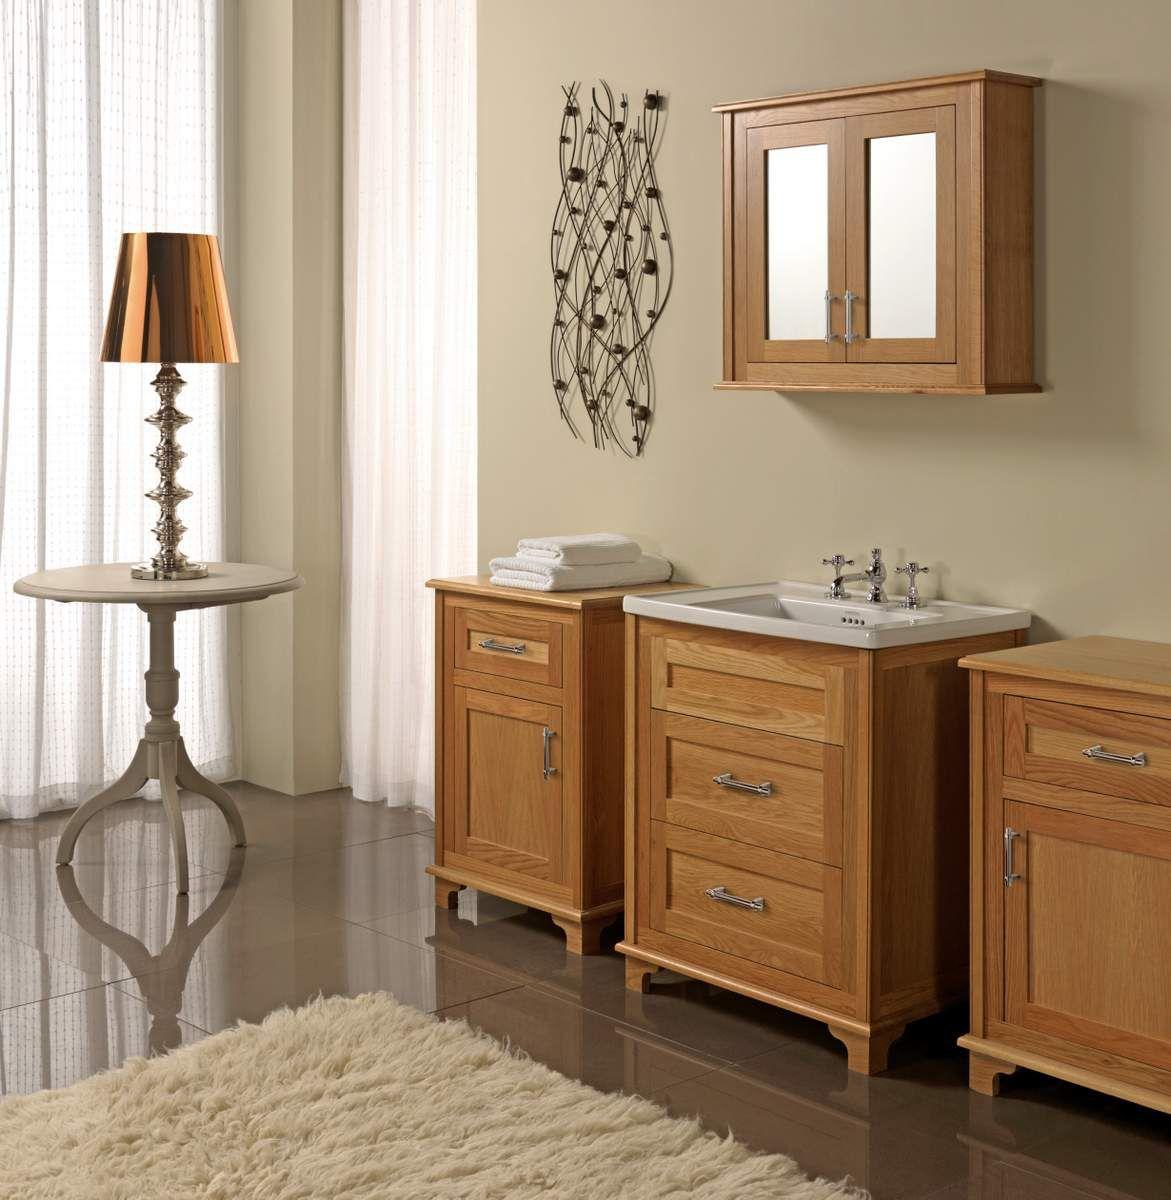 Bathroom vanity 1200 - Imperial Radcliffe Thurlestone 2 Door Mirror Cabinet